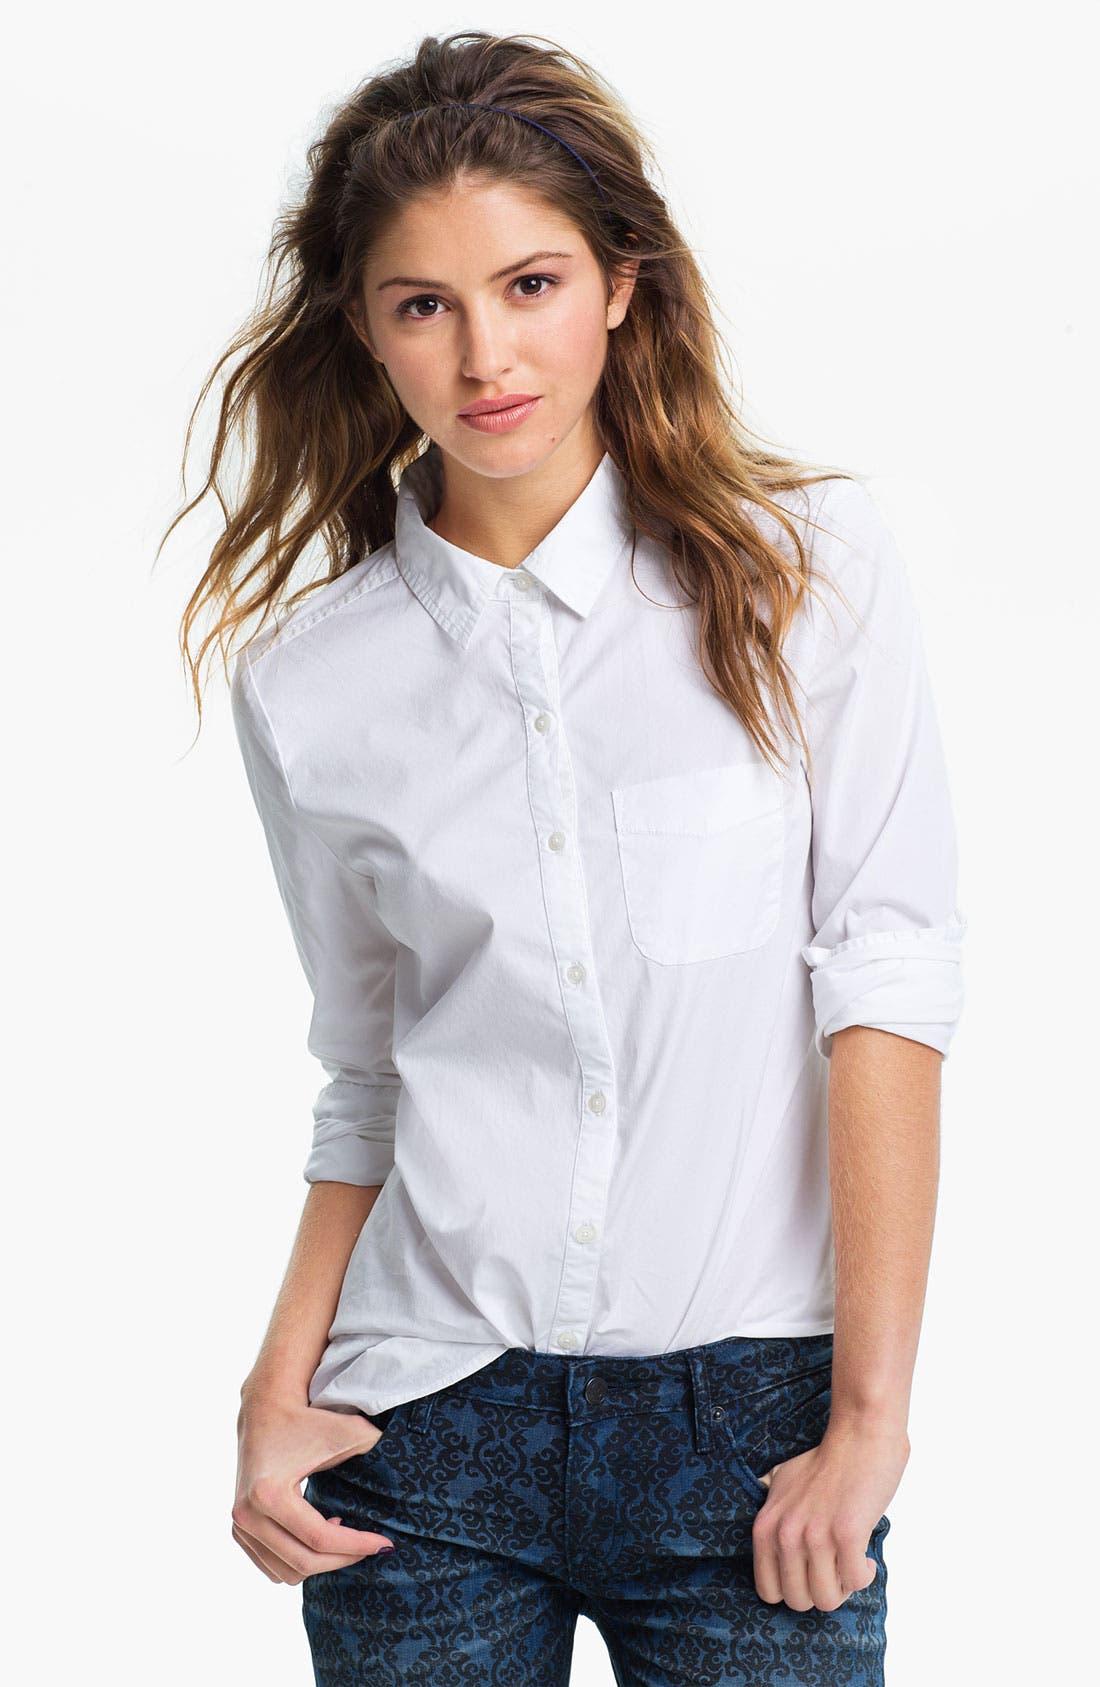 Alternate Image 1 Selected - BP. Woven Button Front Shirt (Juniors)